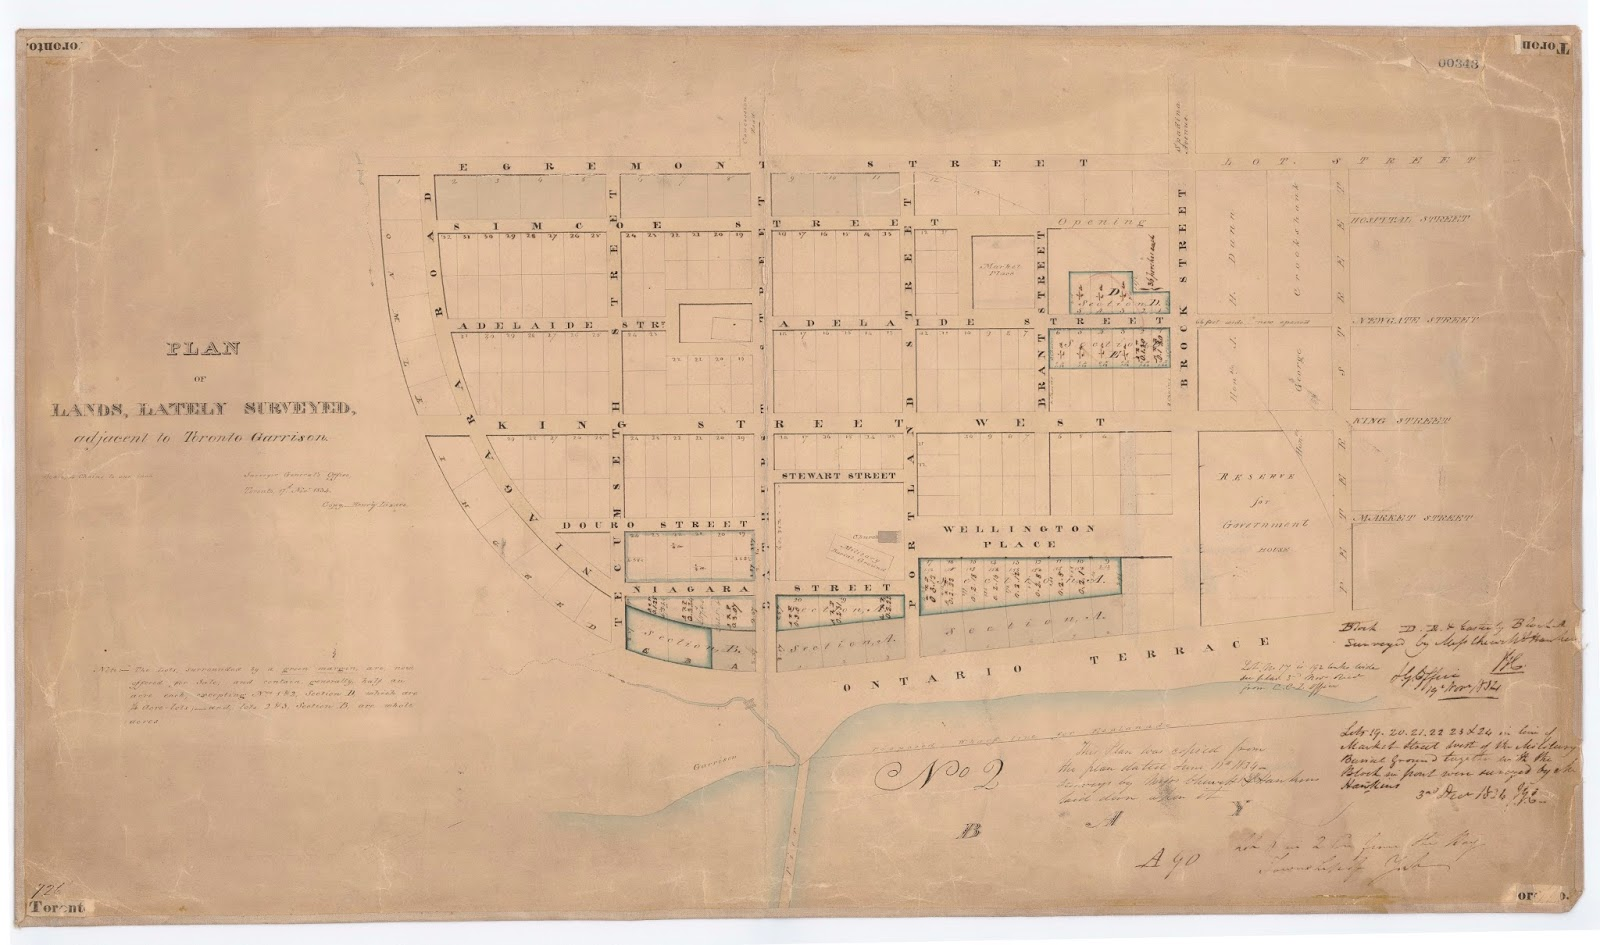 Map: Plan of lands, lately surveyed, adjacent to Toronto Garrison. Surveyor General's office, Toronto 17th Novr 1834, Copy – Henry Lizars.